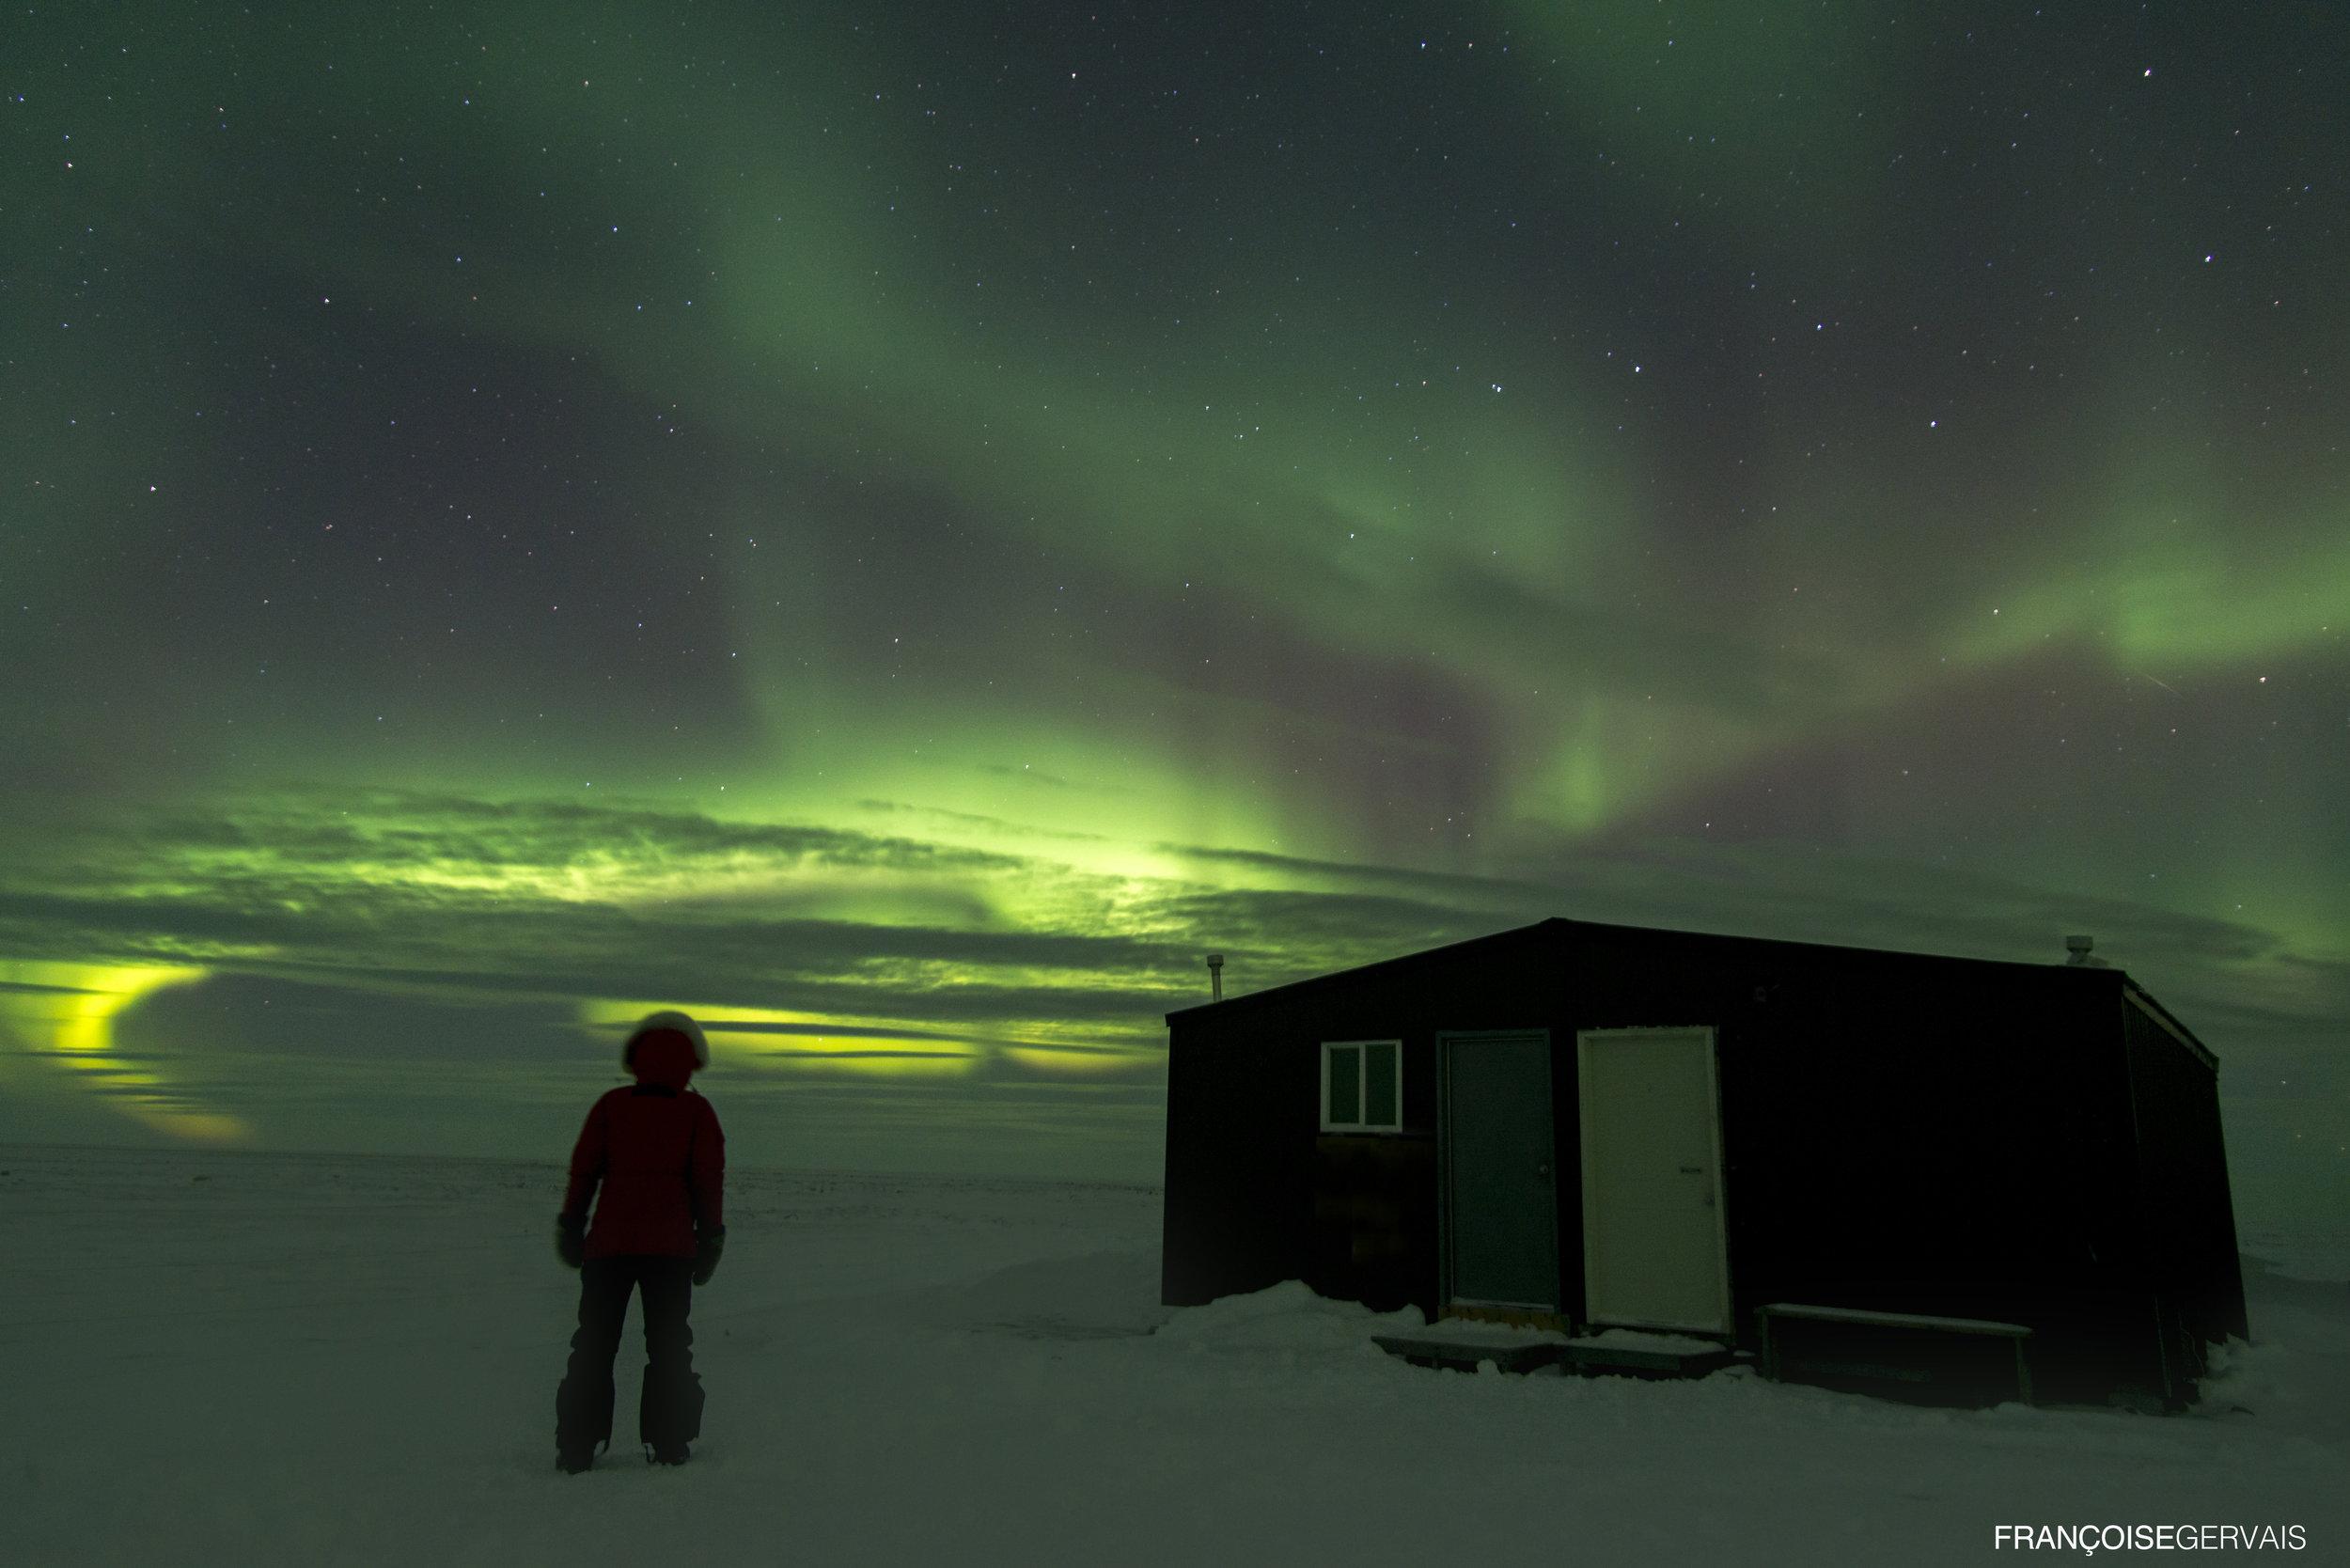 Arctic Kingdom FRANCOISE GERVAISE Polar bear cabin and northern lights_DSC_1994.jpg